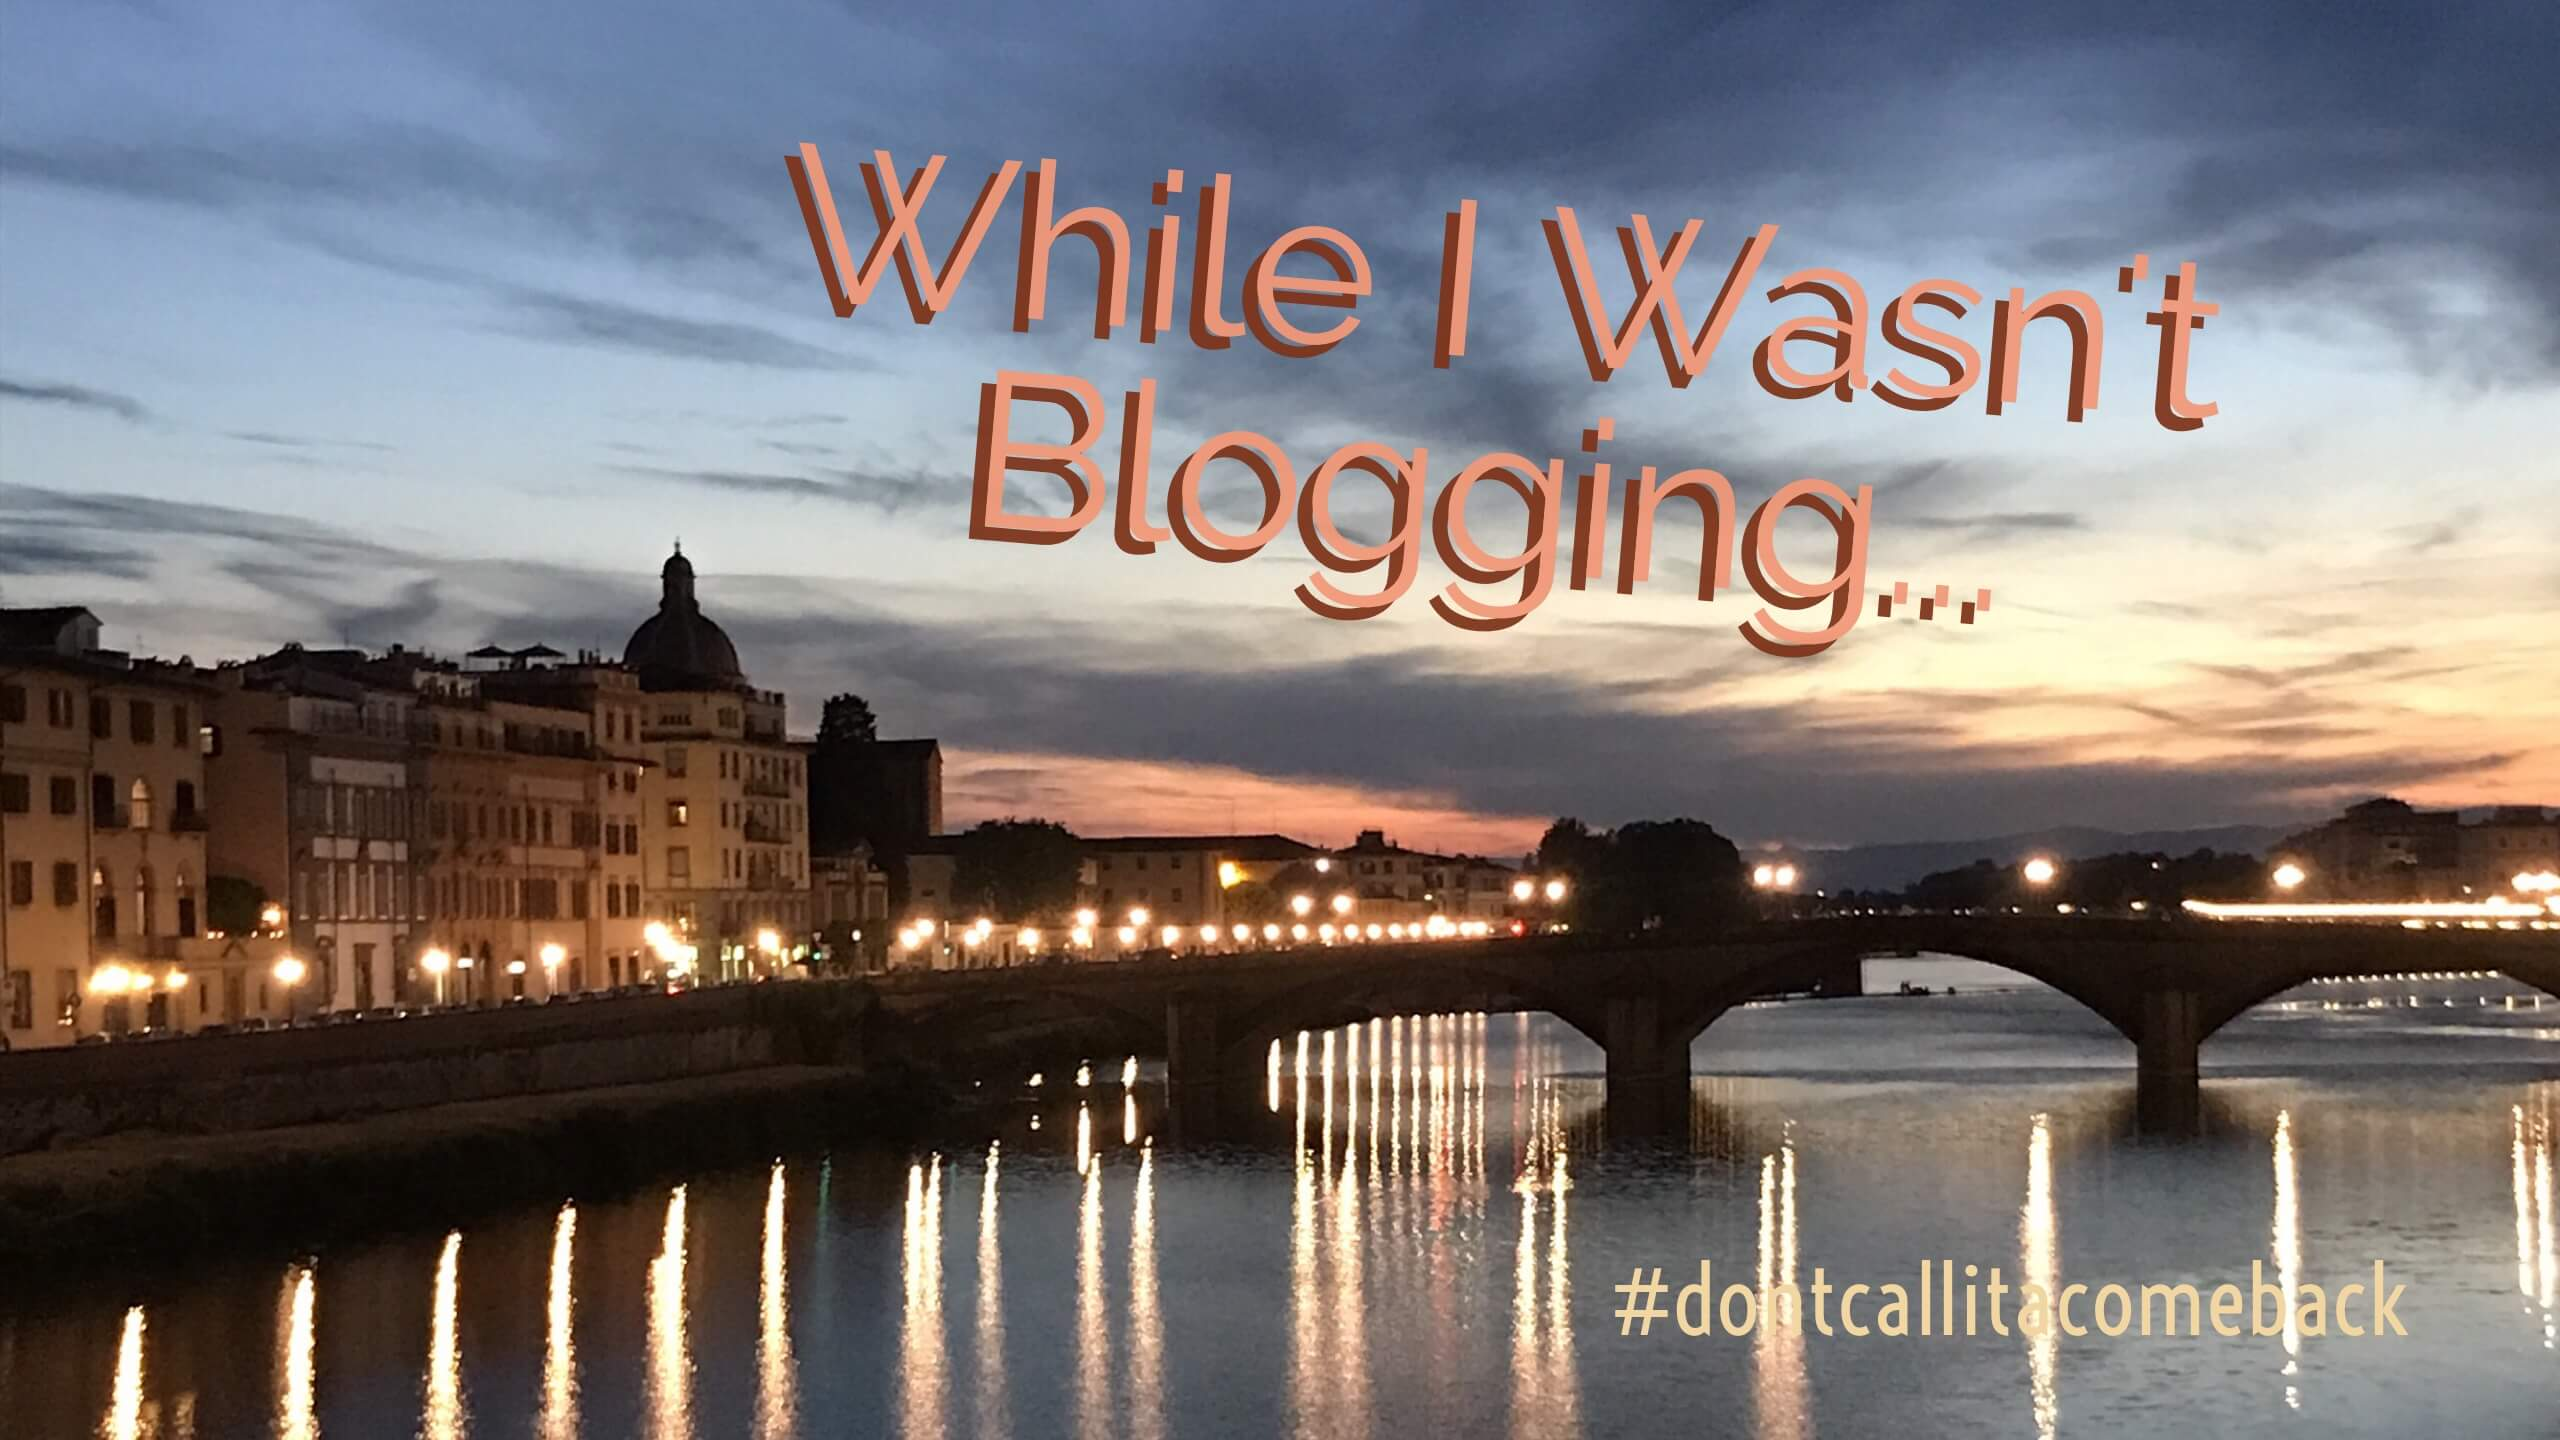 while i wasnt blogging #dontcallitacomeback